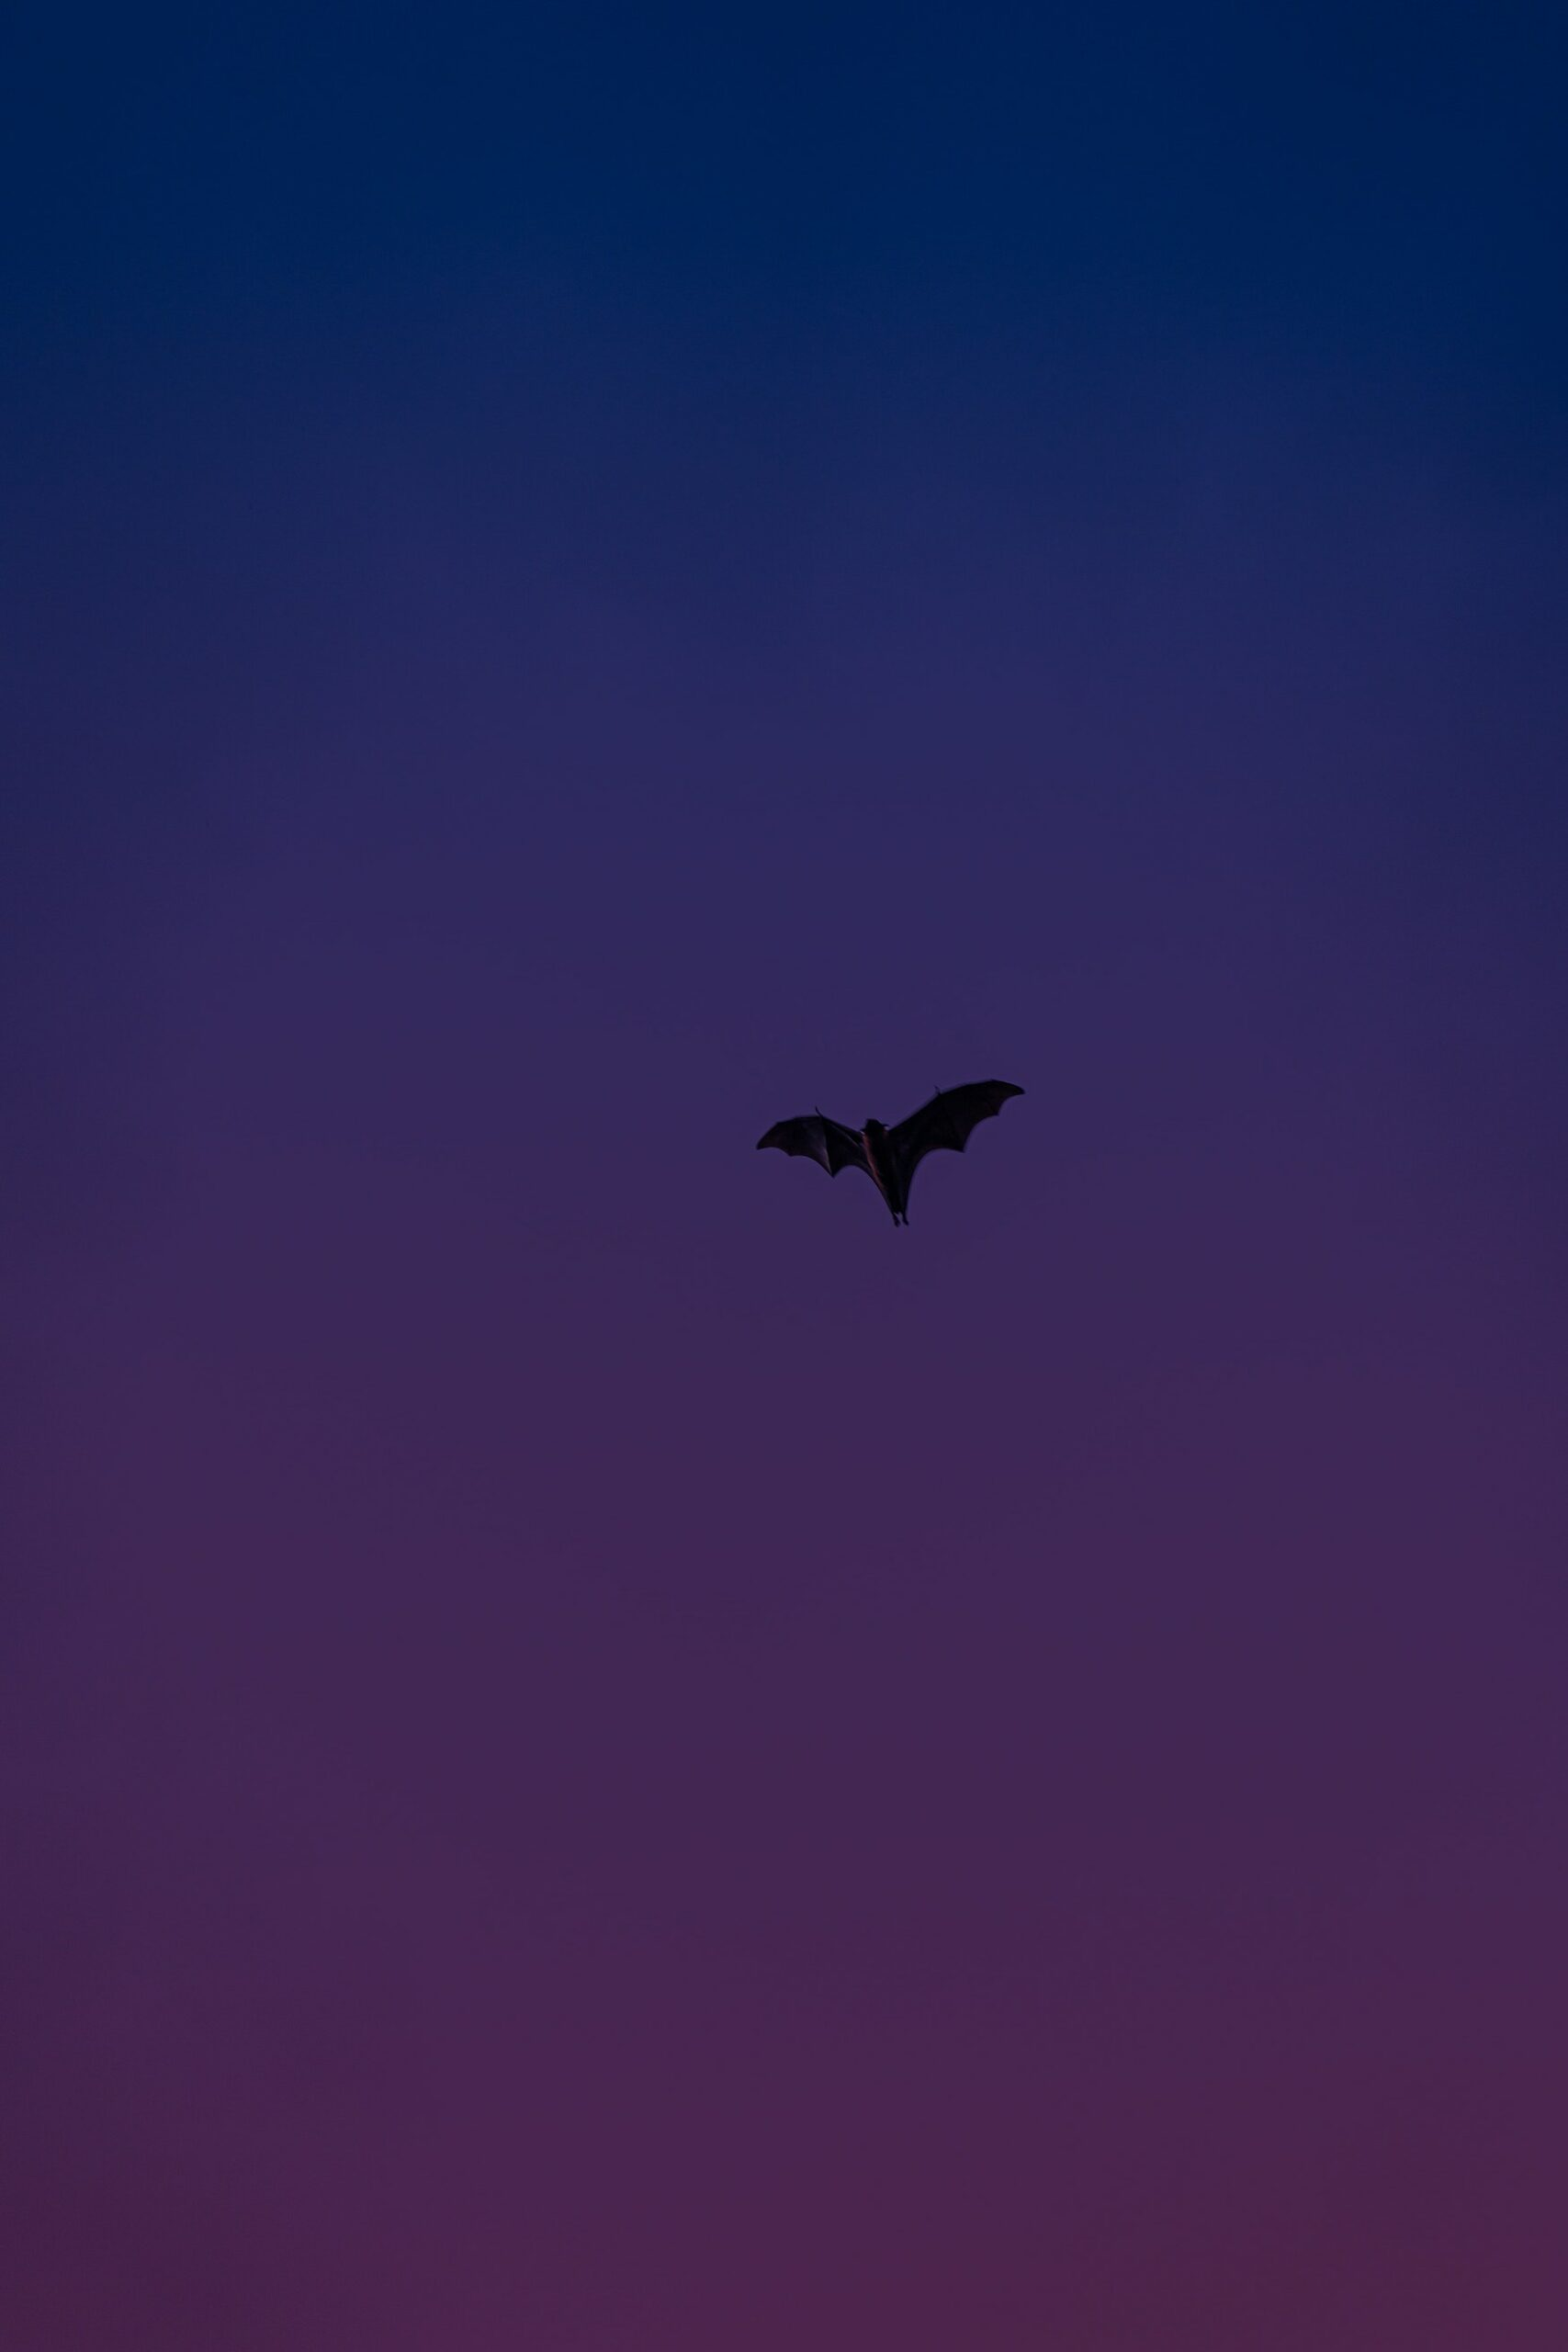 Fledermaus am Nachthimmel